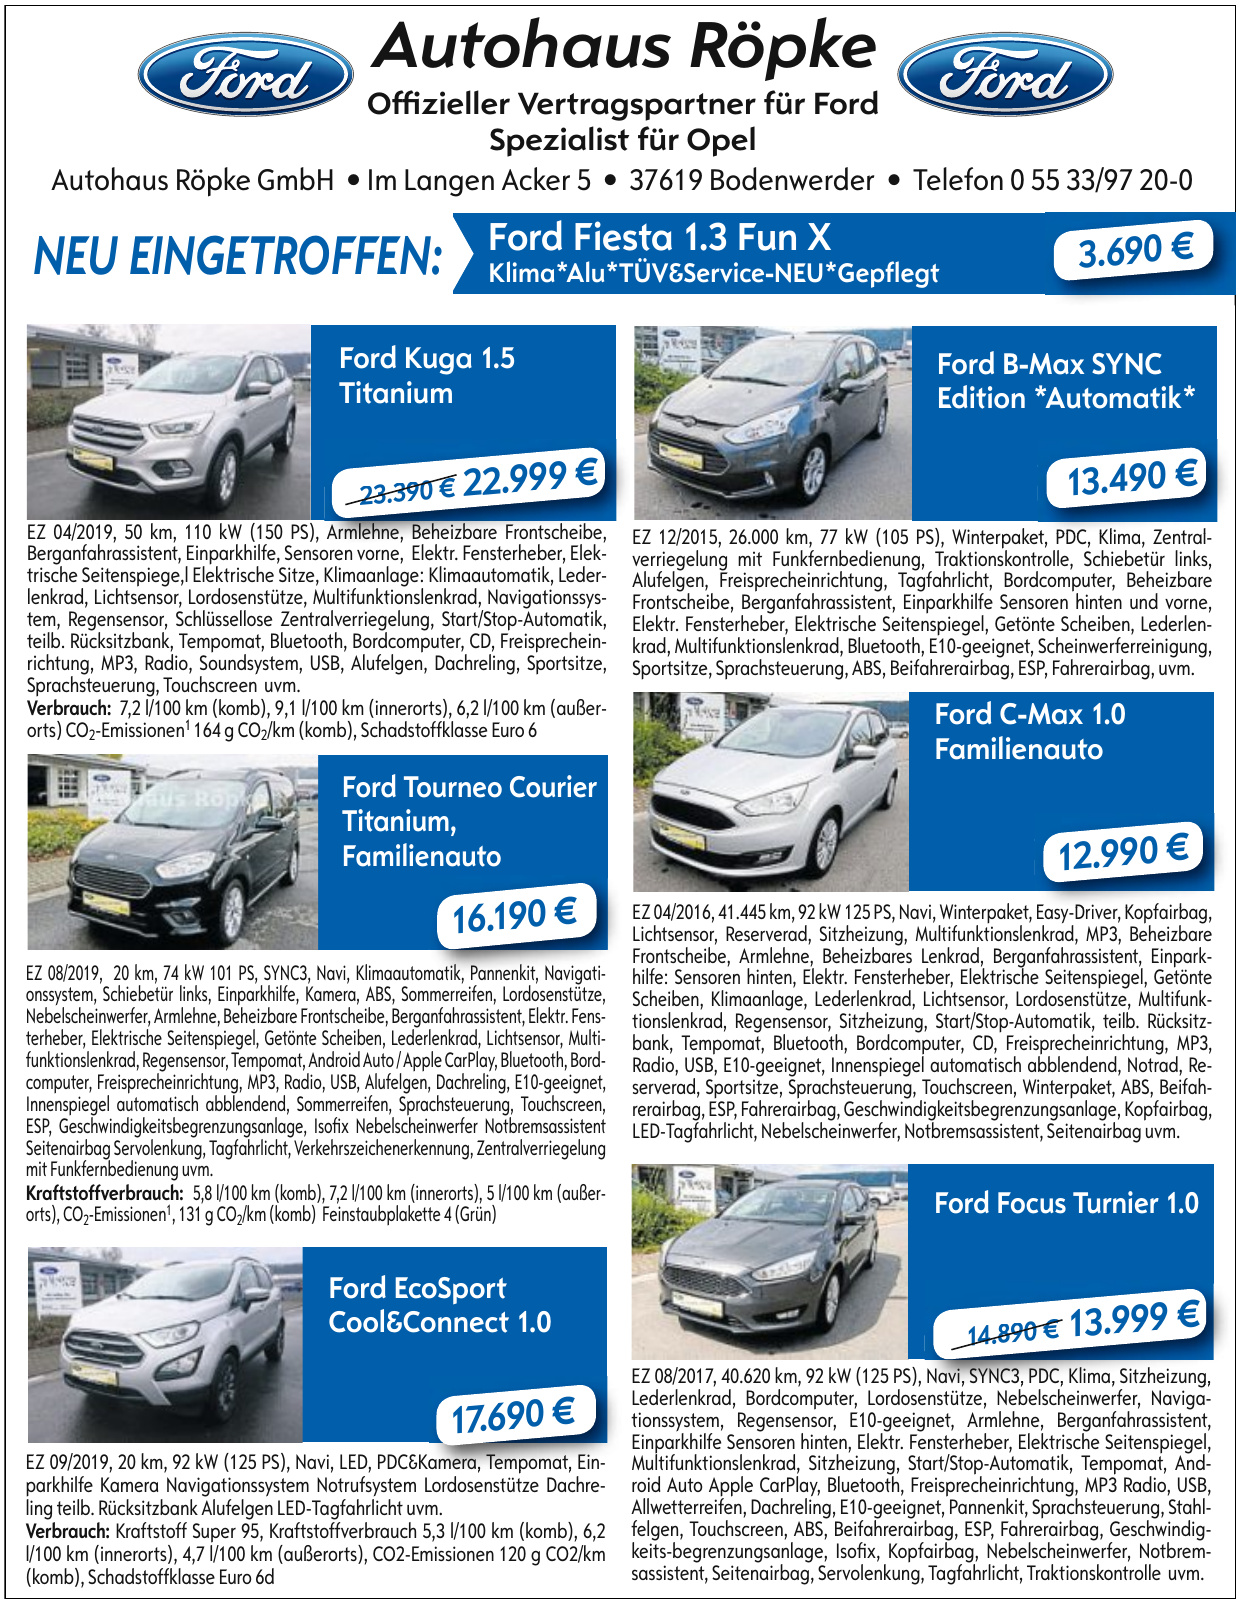 Autohaus Röpke GmbH